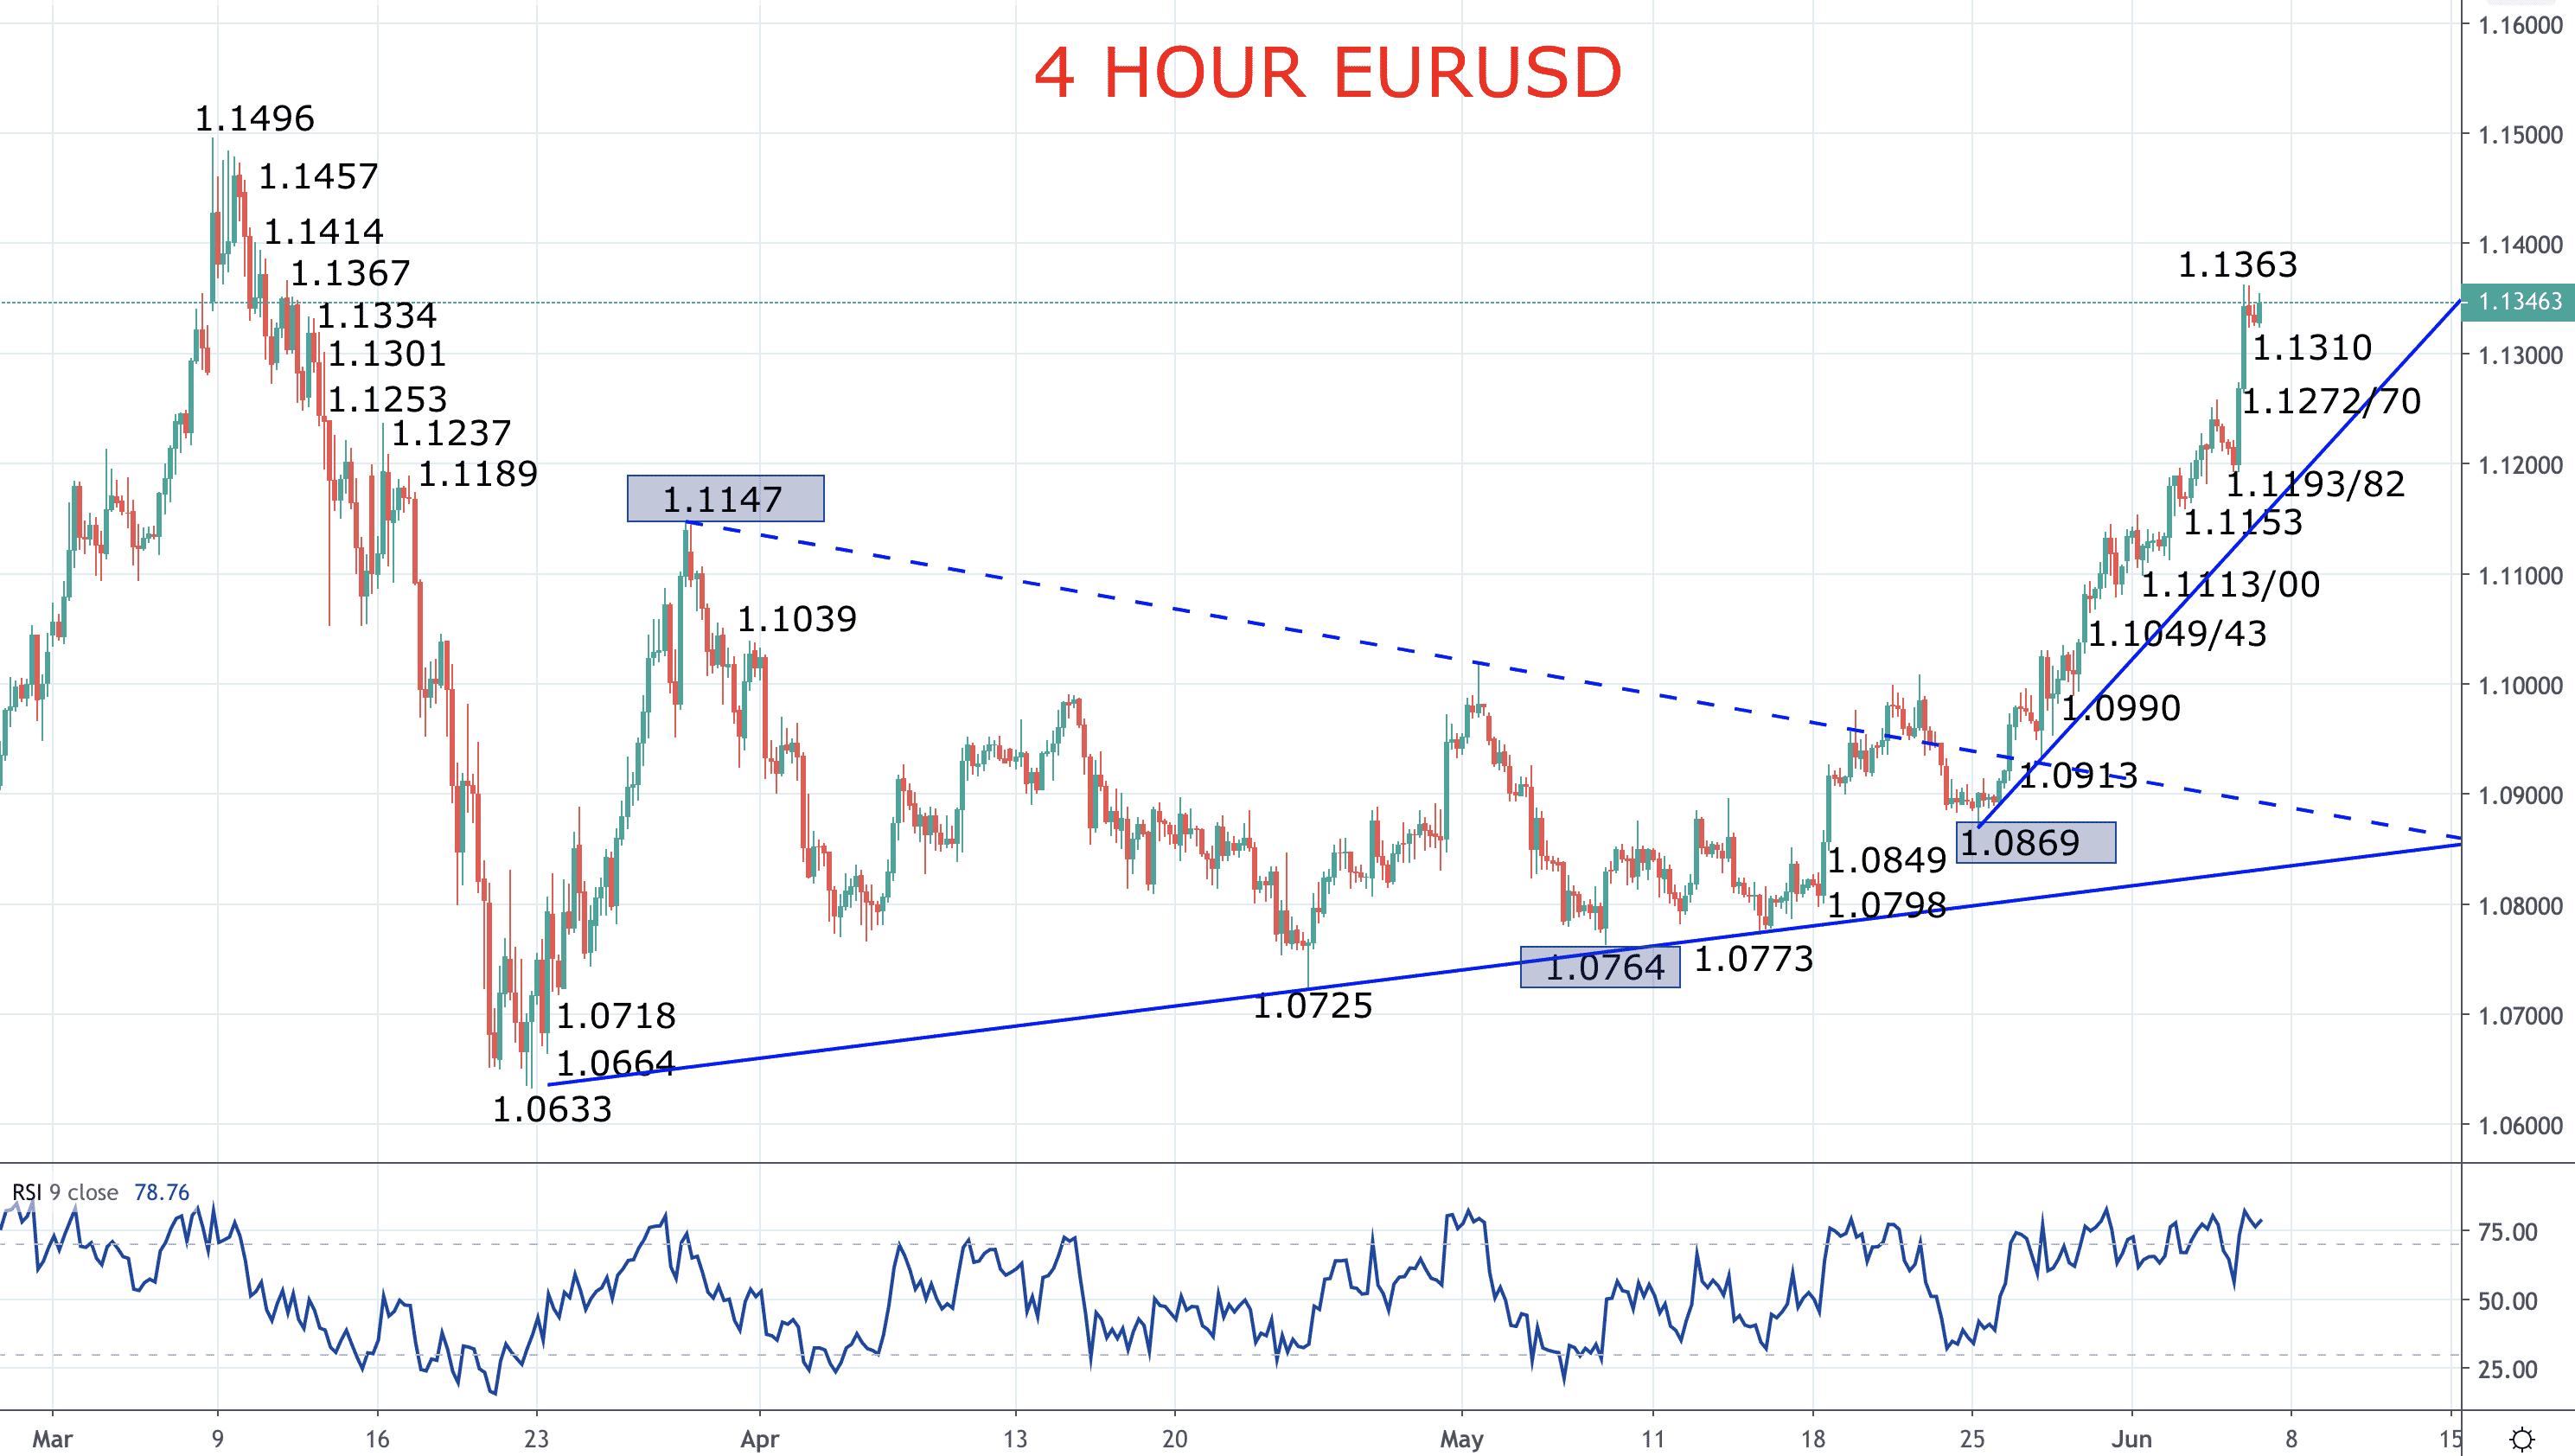 Euro surges after ECB PEPP expansion (EURUSD Forecast) Image